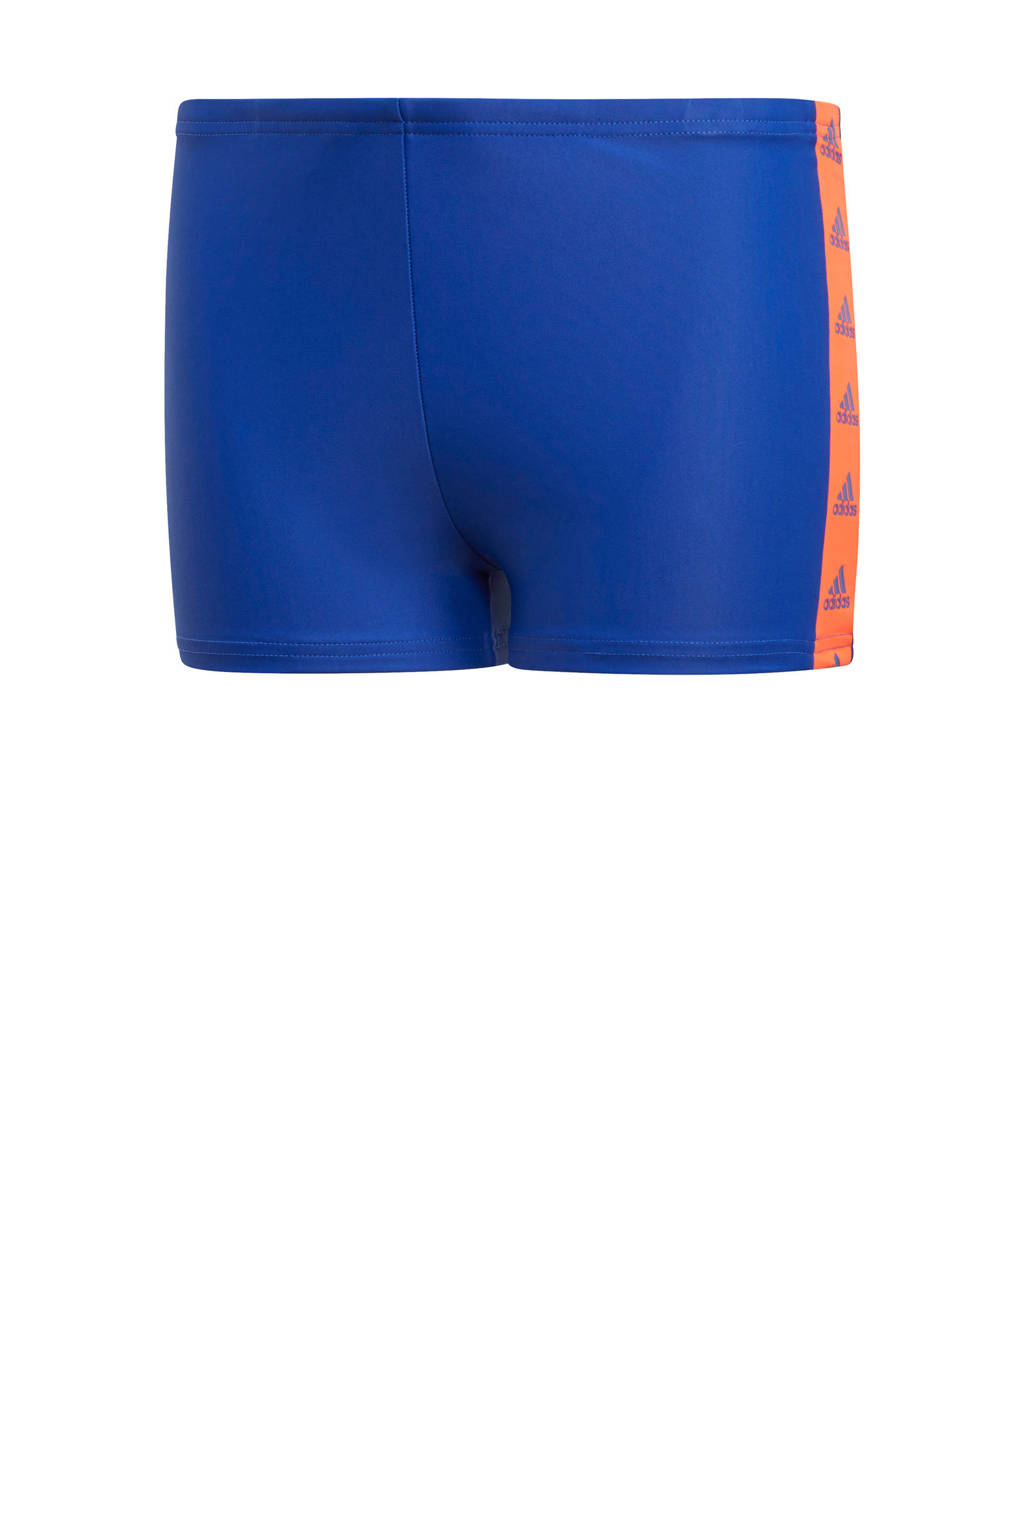 adidas Performance zwemboxer blauw, Blauw / Oranje